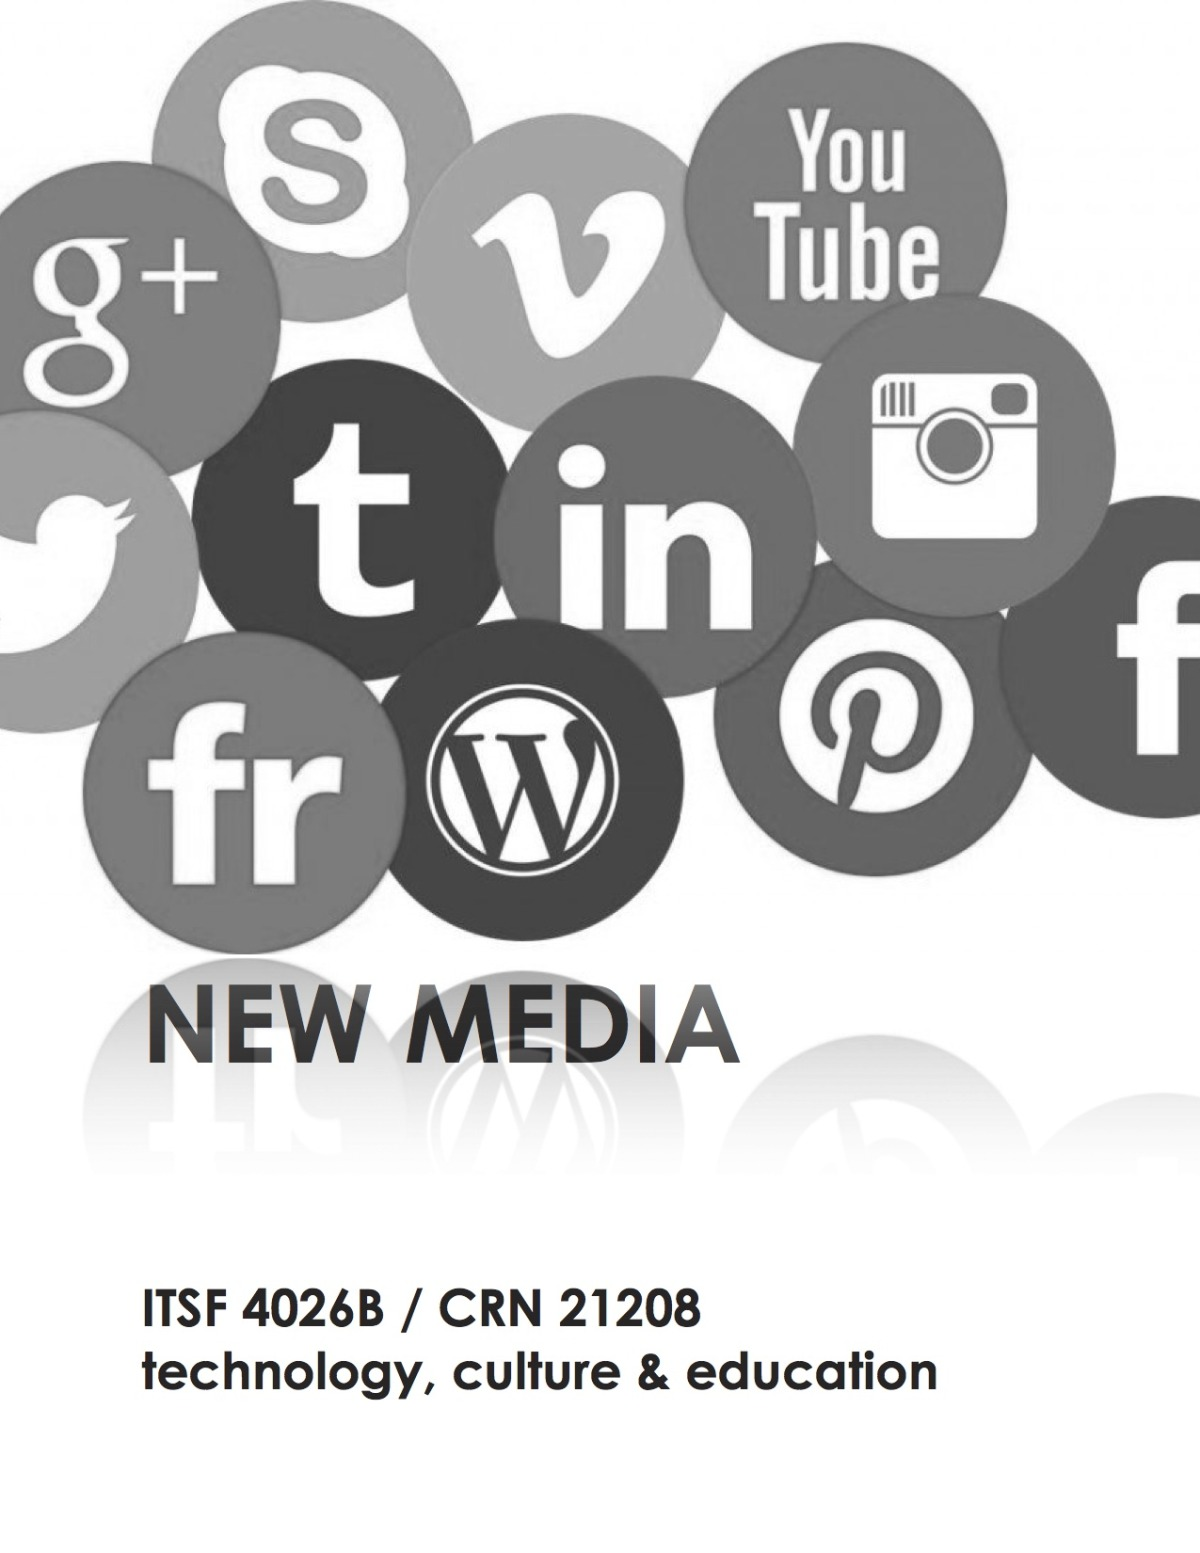 itsf 4026b flyers - new media.jpg